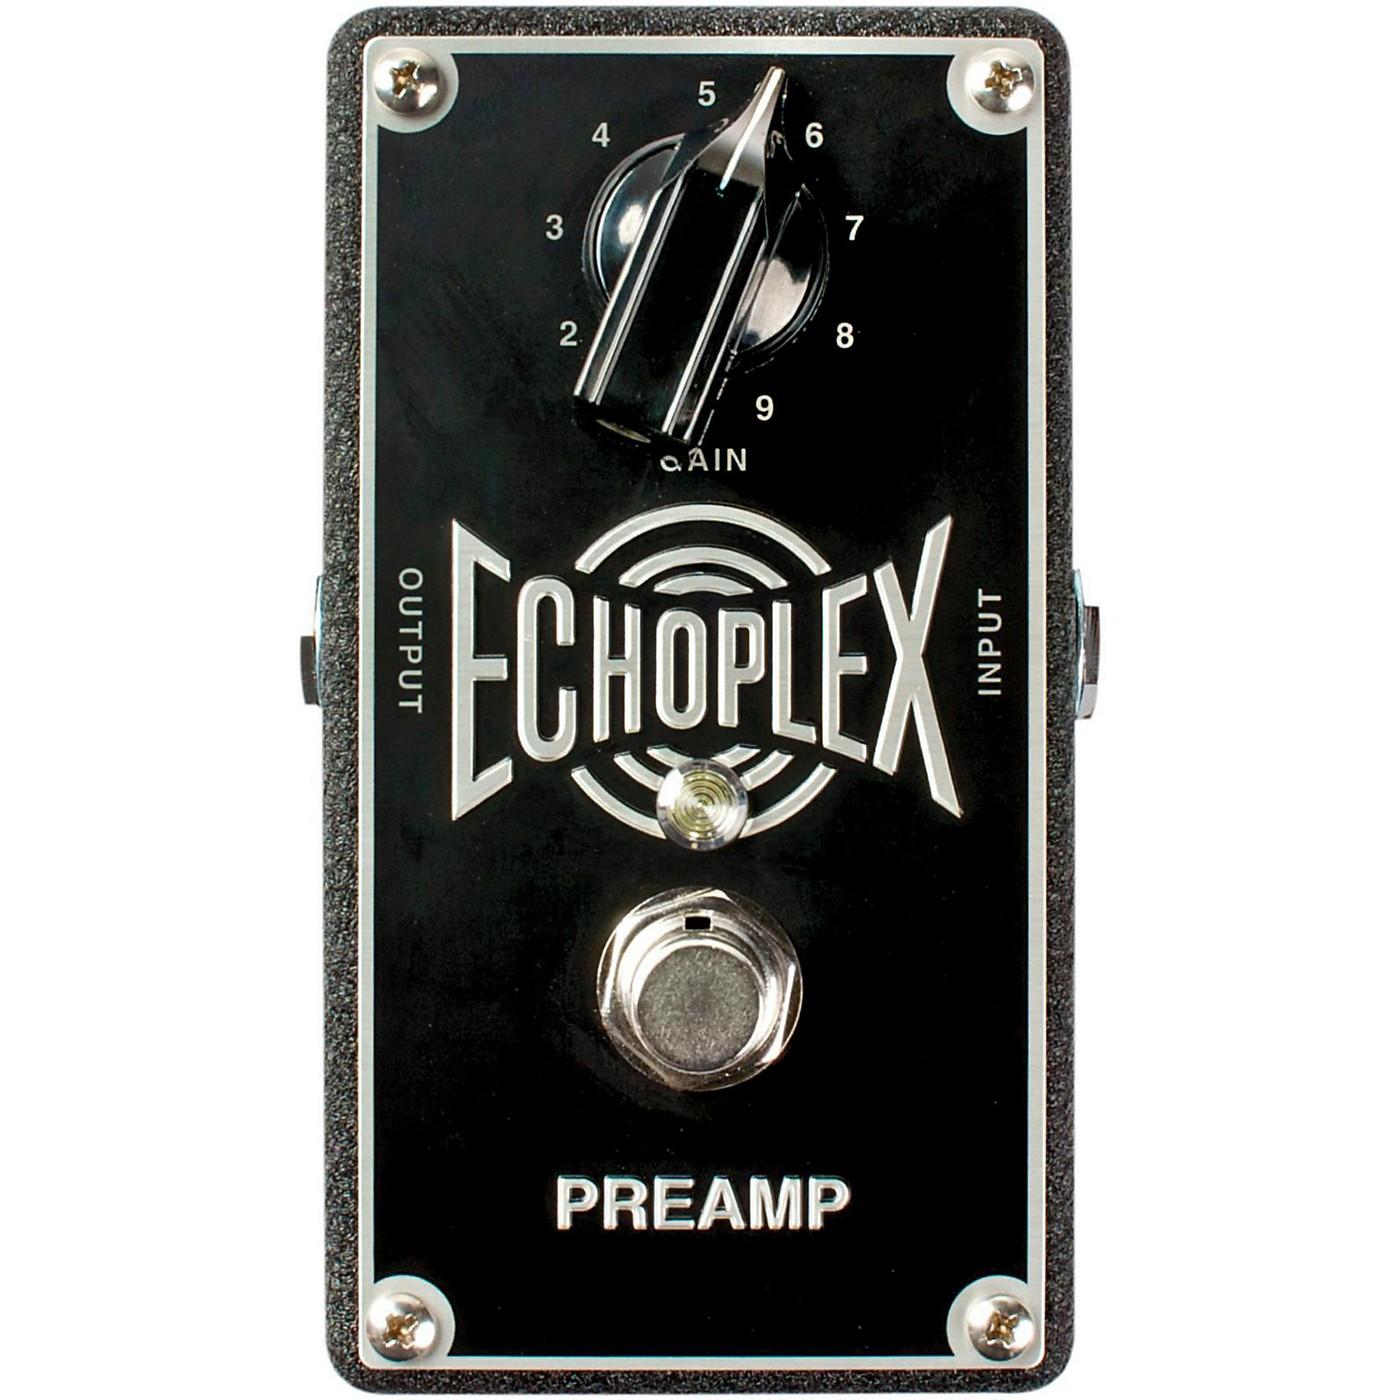 Dunlop Echoplex Preamp Guitar Effects Pedal thumbnail